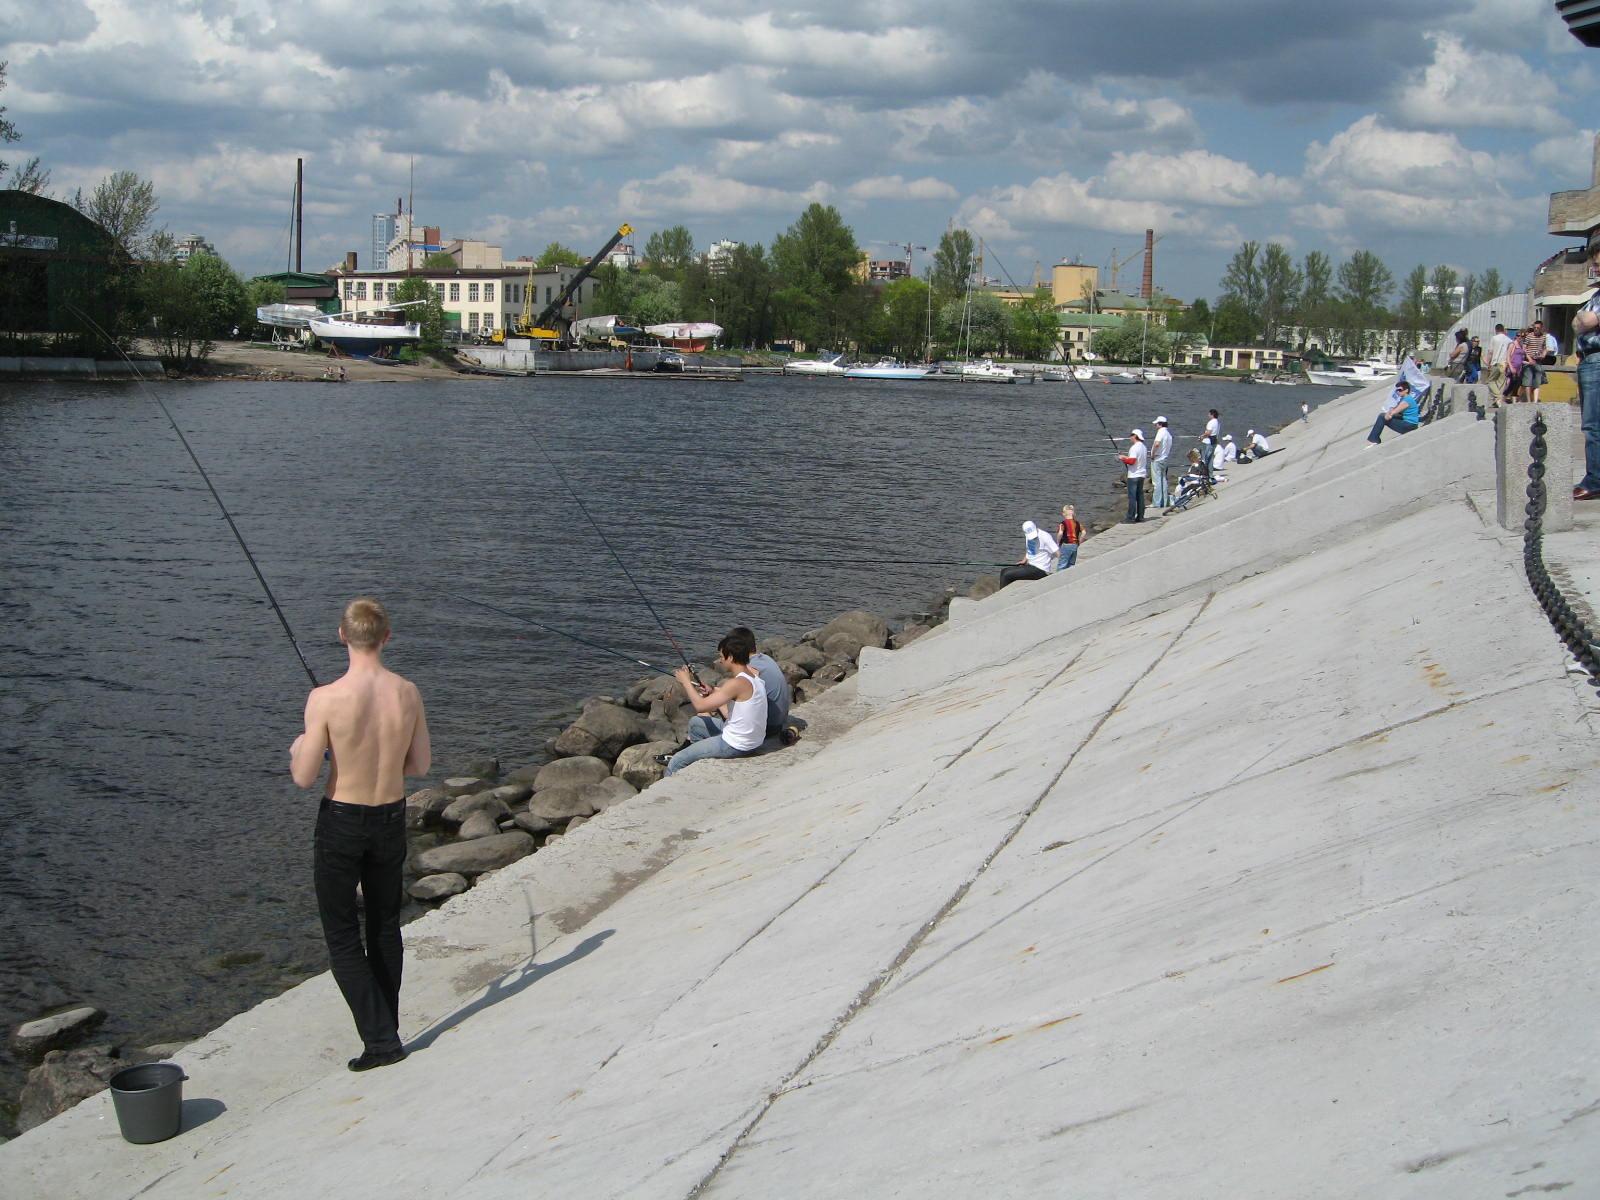 Васильевский остров, 2010 г. Фото: hram-ov (Wikimedia Commons)